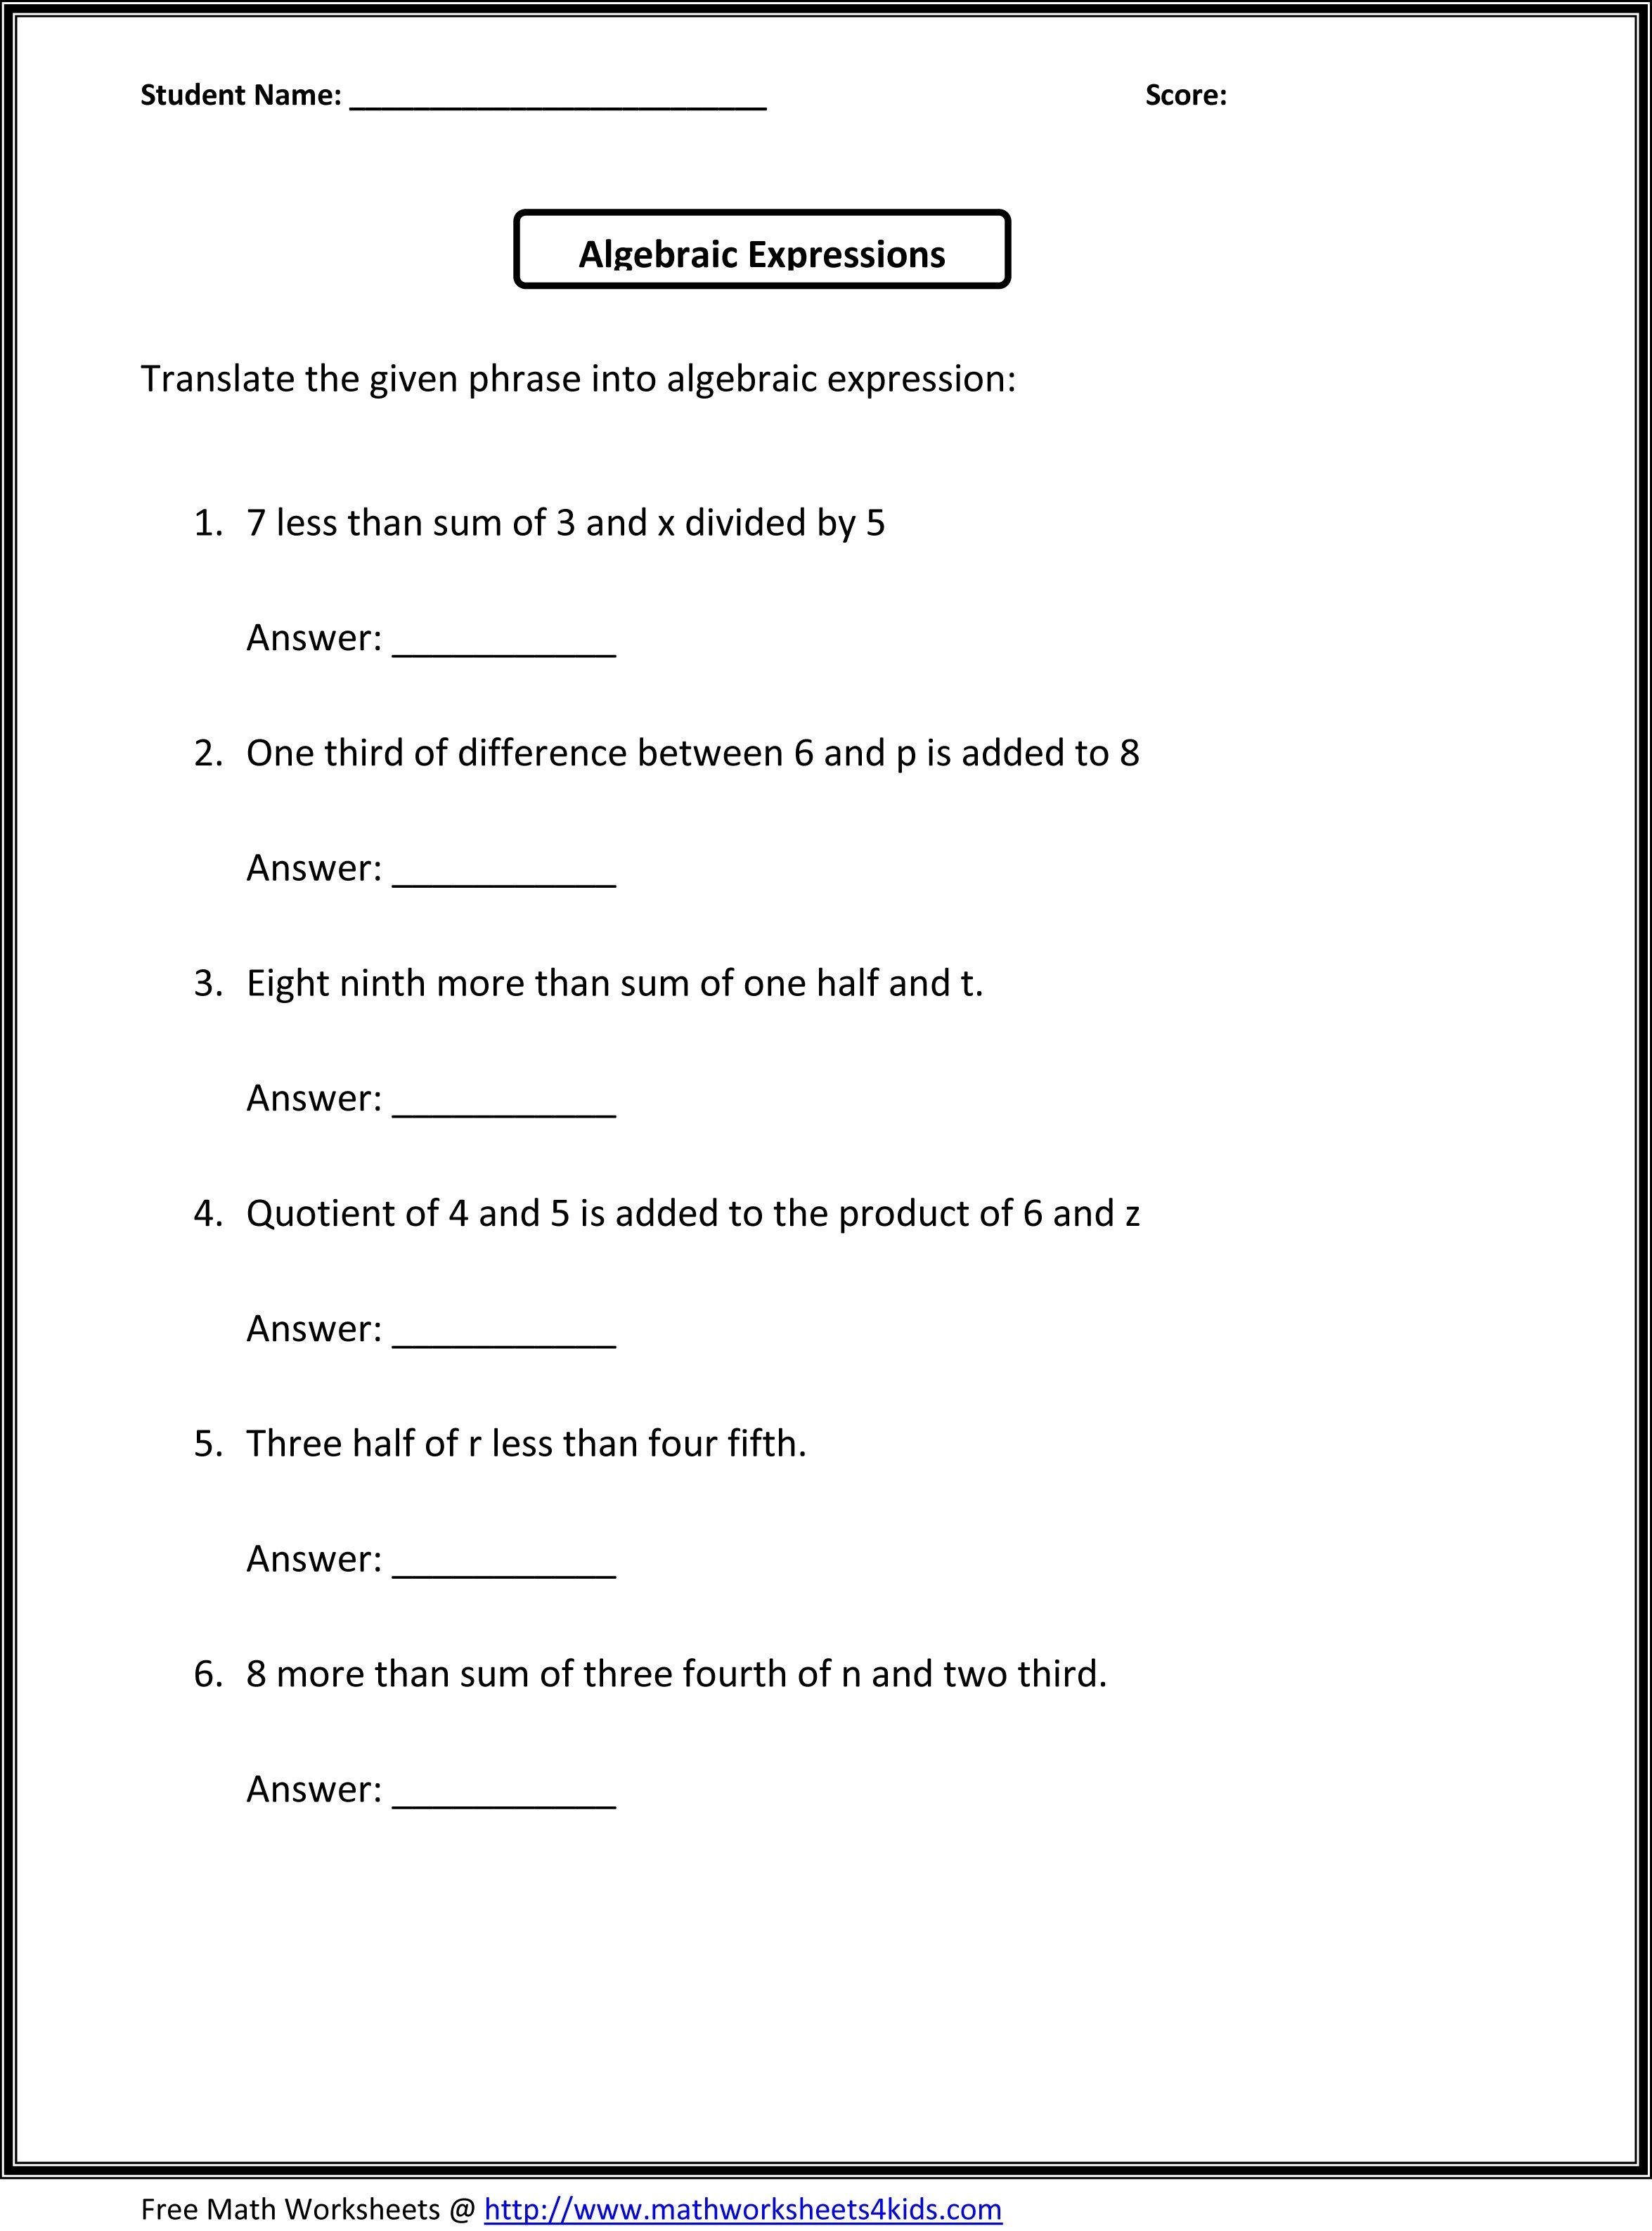 Evaluation Science Coursework Wgu Teachers College Mat Or